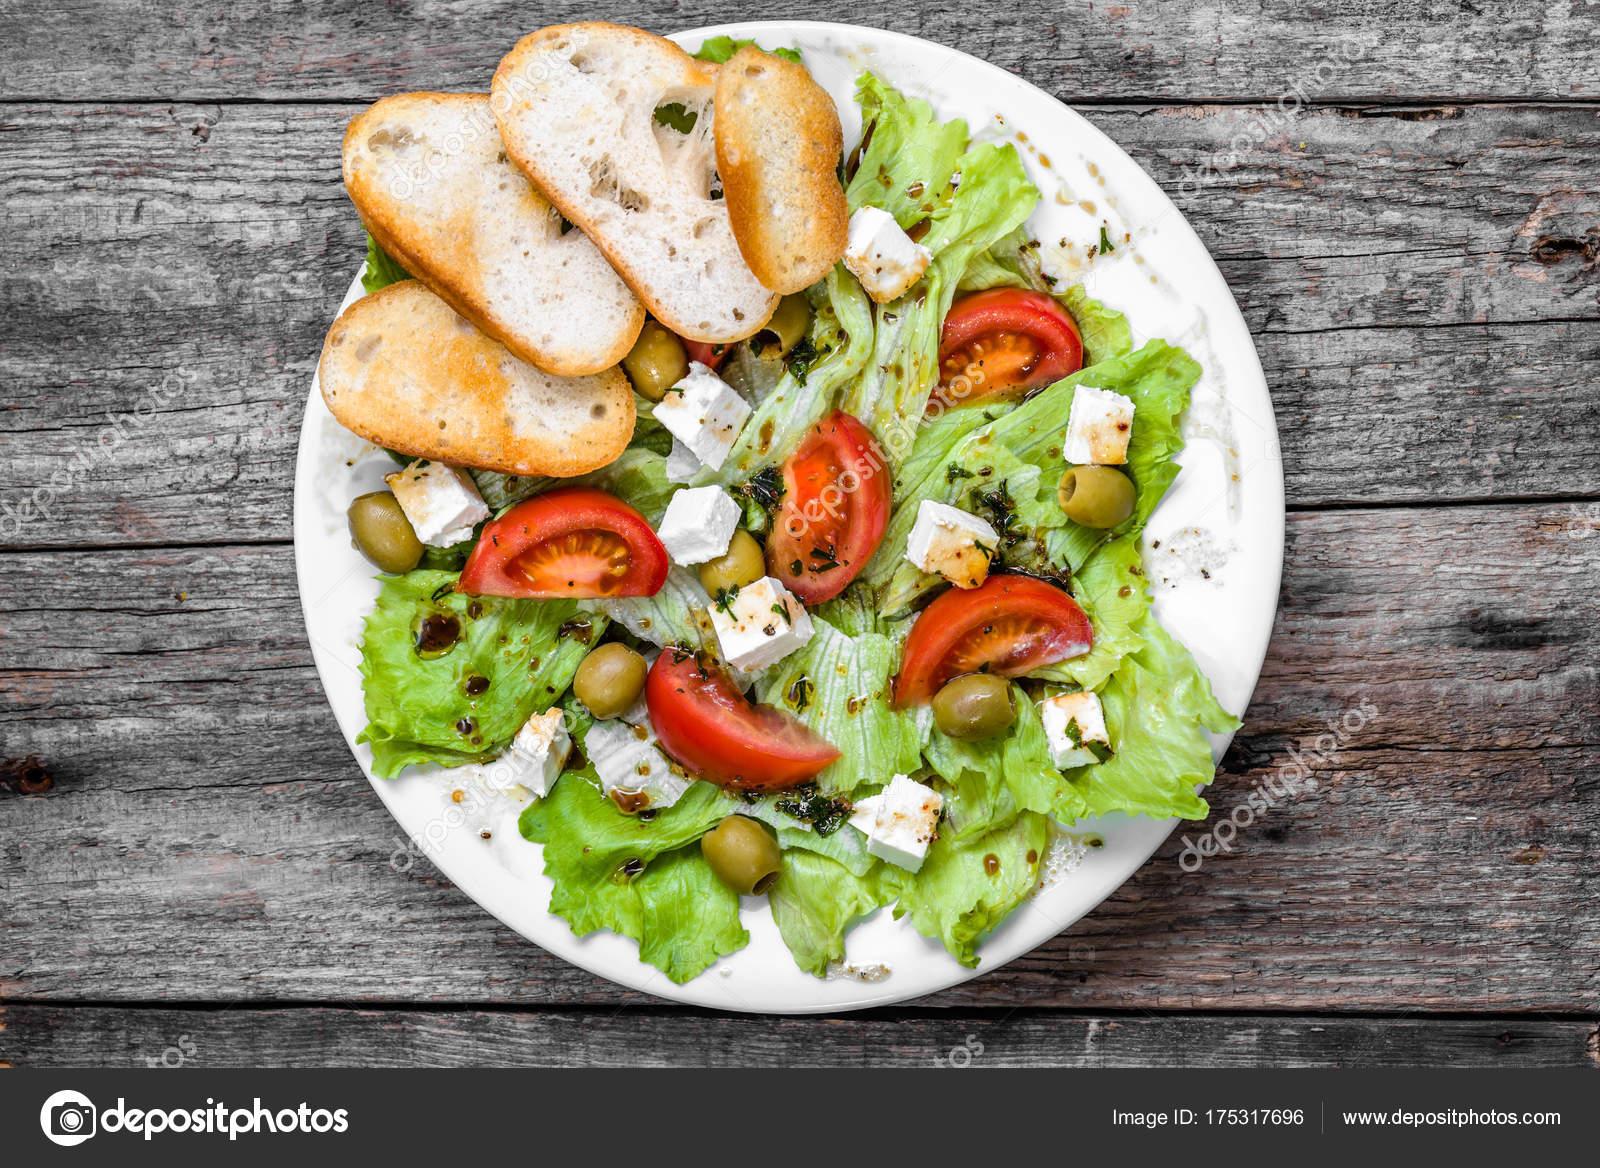 De dieta platos